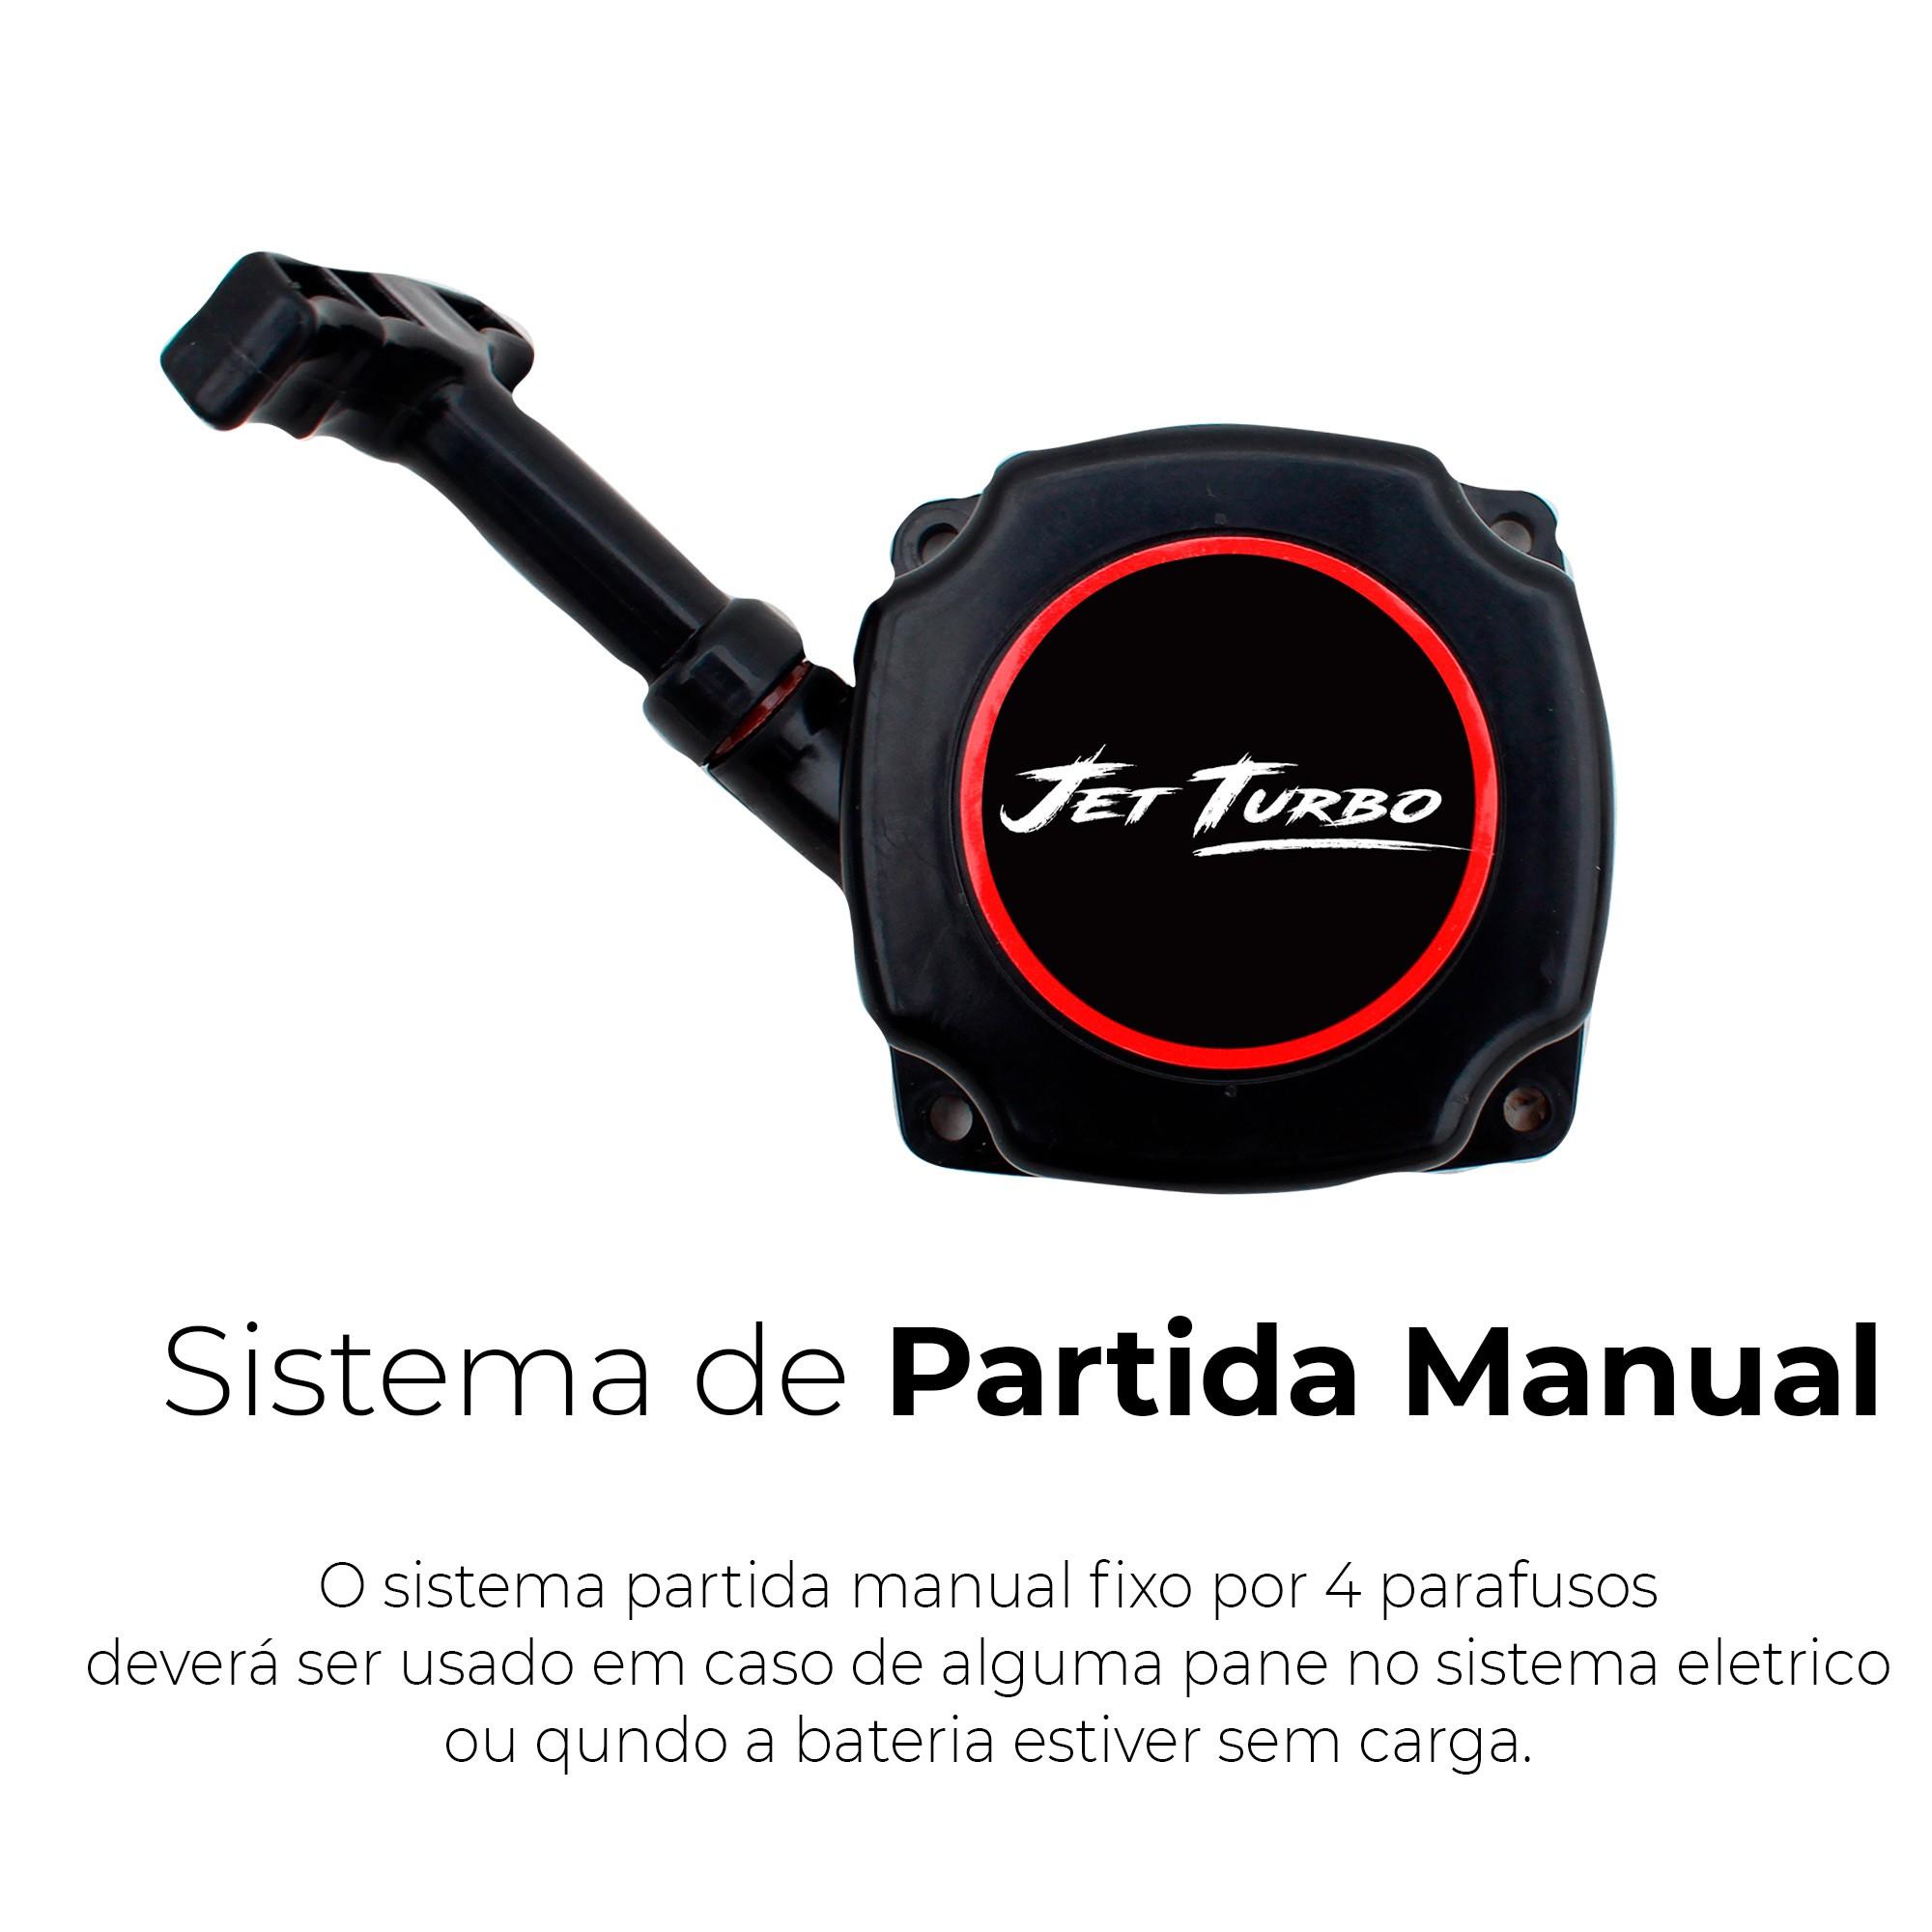 Jet Turbo Cut Partida Elétrica C/ Haste (cód.4751-0103)